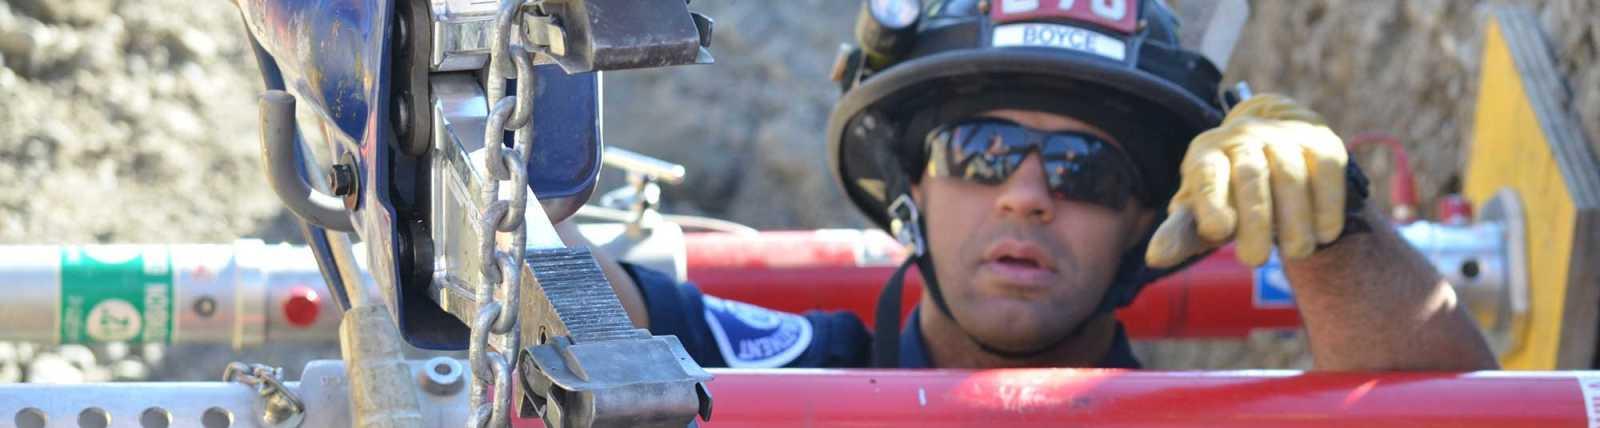 Puget Sound Regional Fire Authority